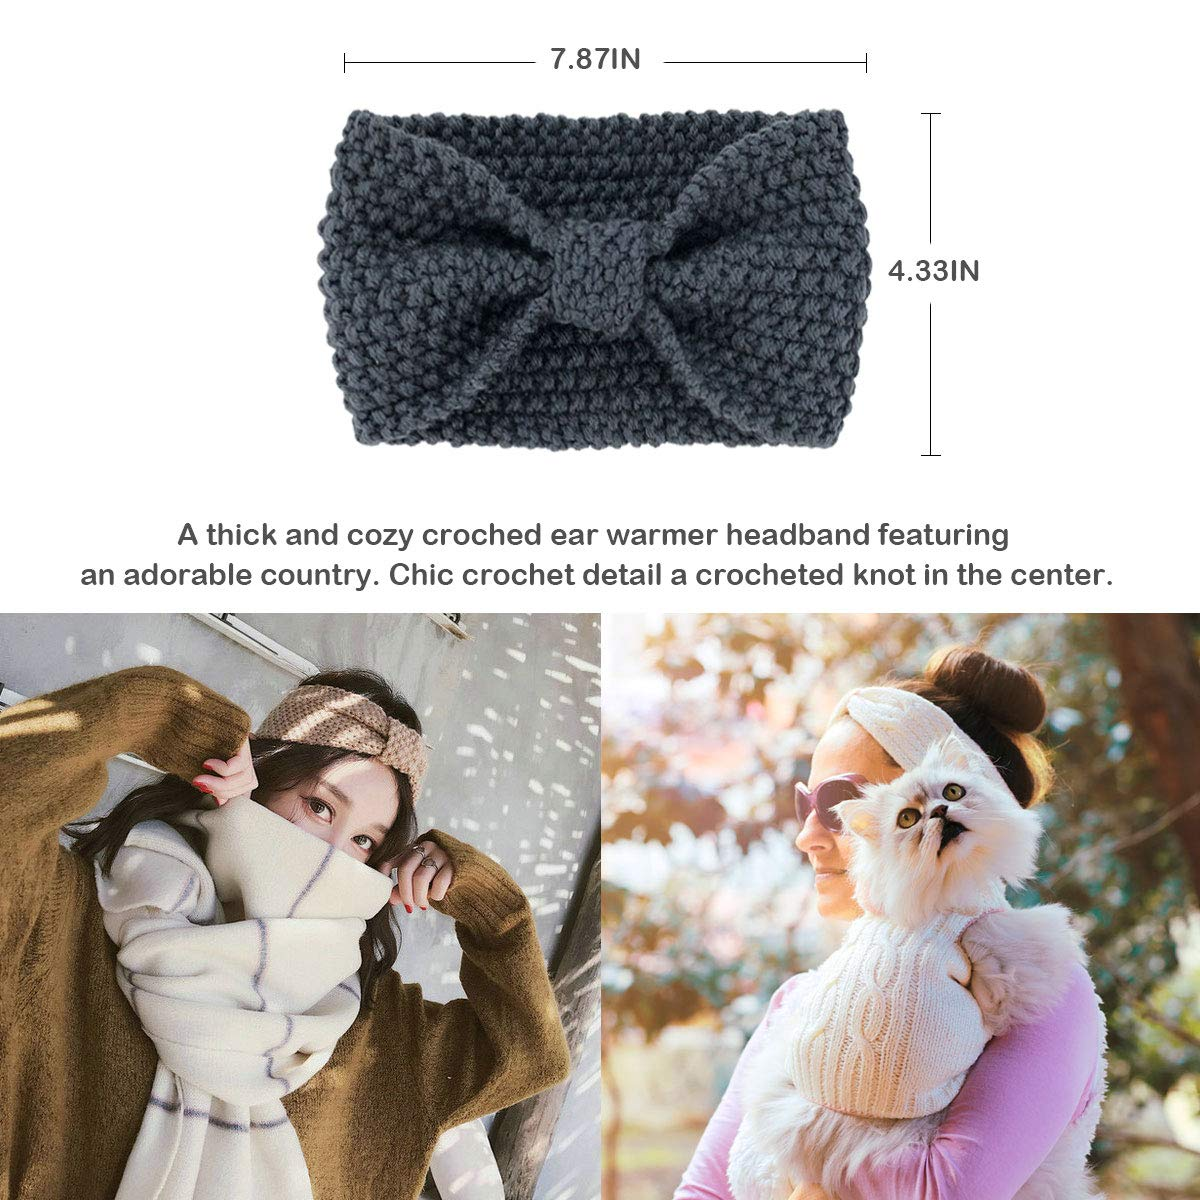 Womens Winter Knitted Headband - Soft Crochet Bow Twist Hair Band Turban Headwrap Hat Cap Ear Warmer,4Pack,Black+khaki+grey+white,One size